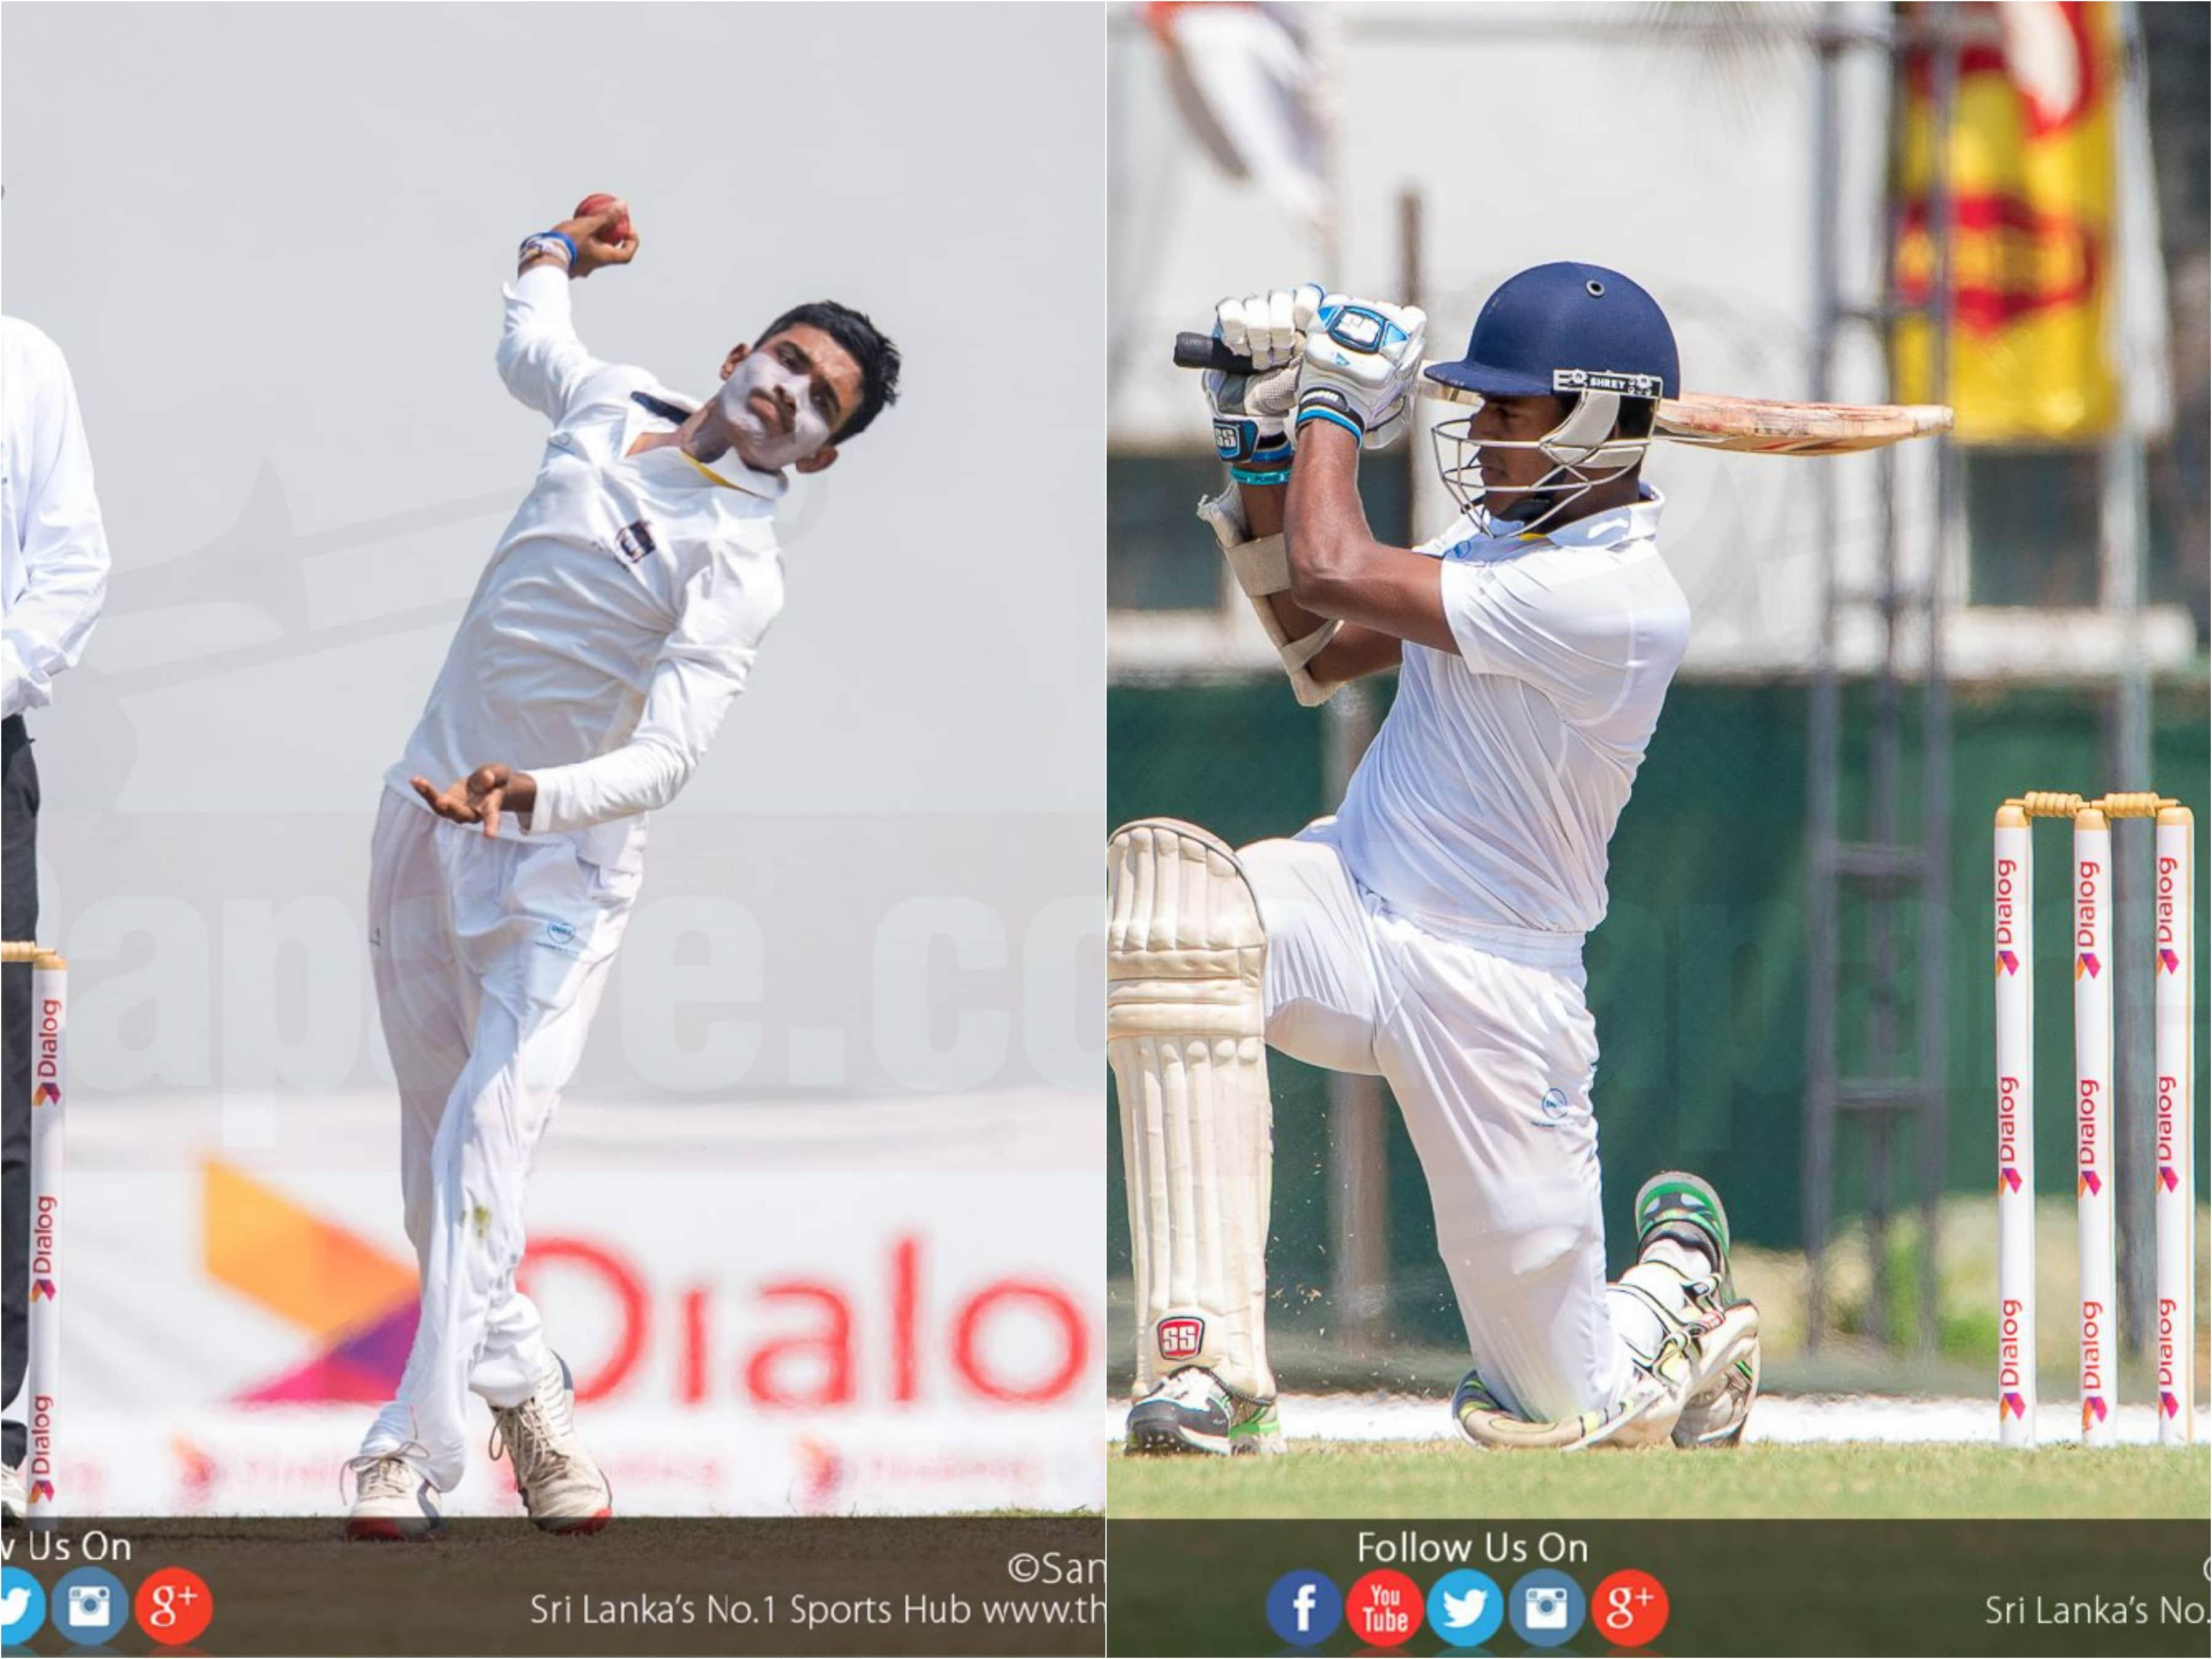 Hashan reaches 1000, Taneesha reaches 100 as Pathana make a comeback